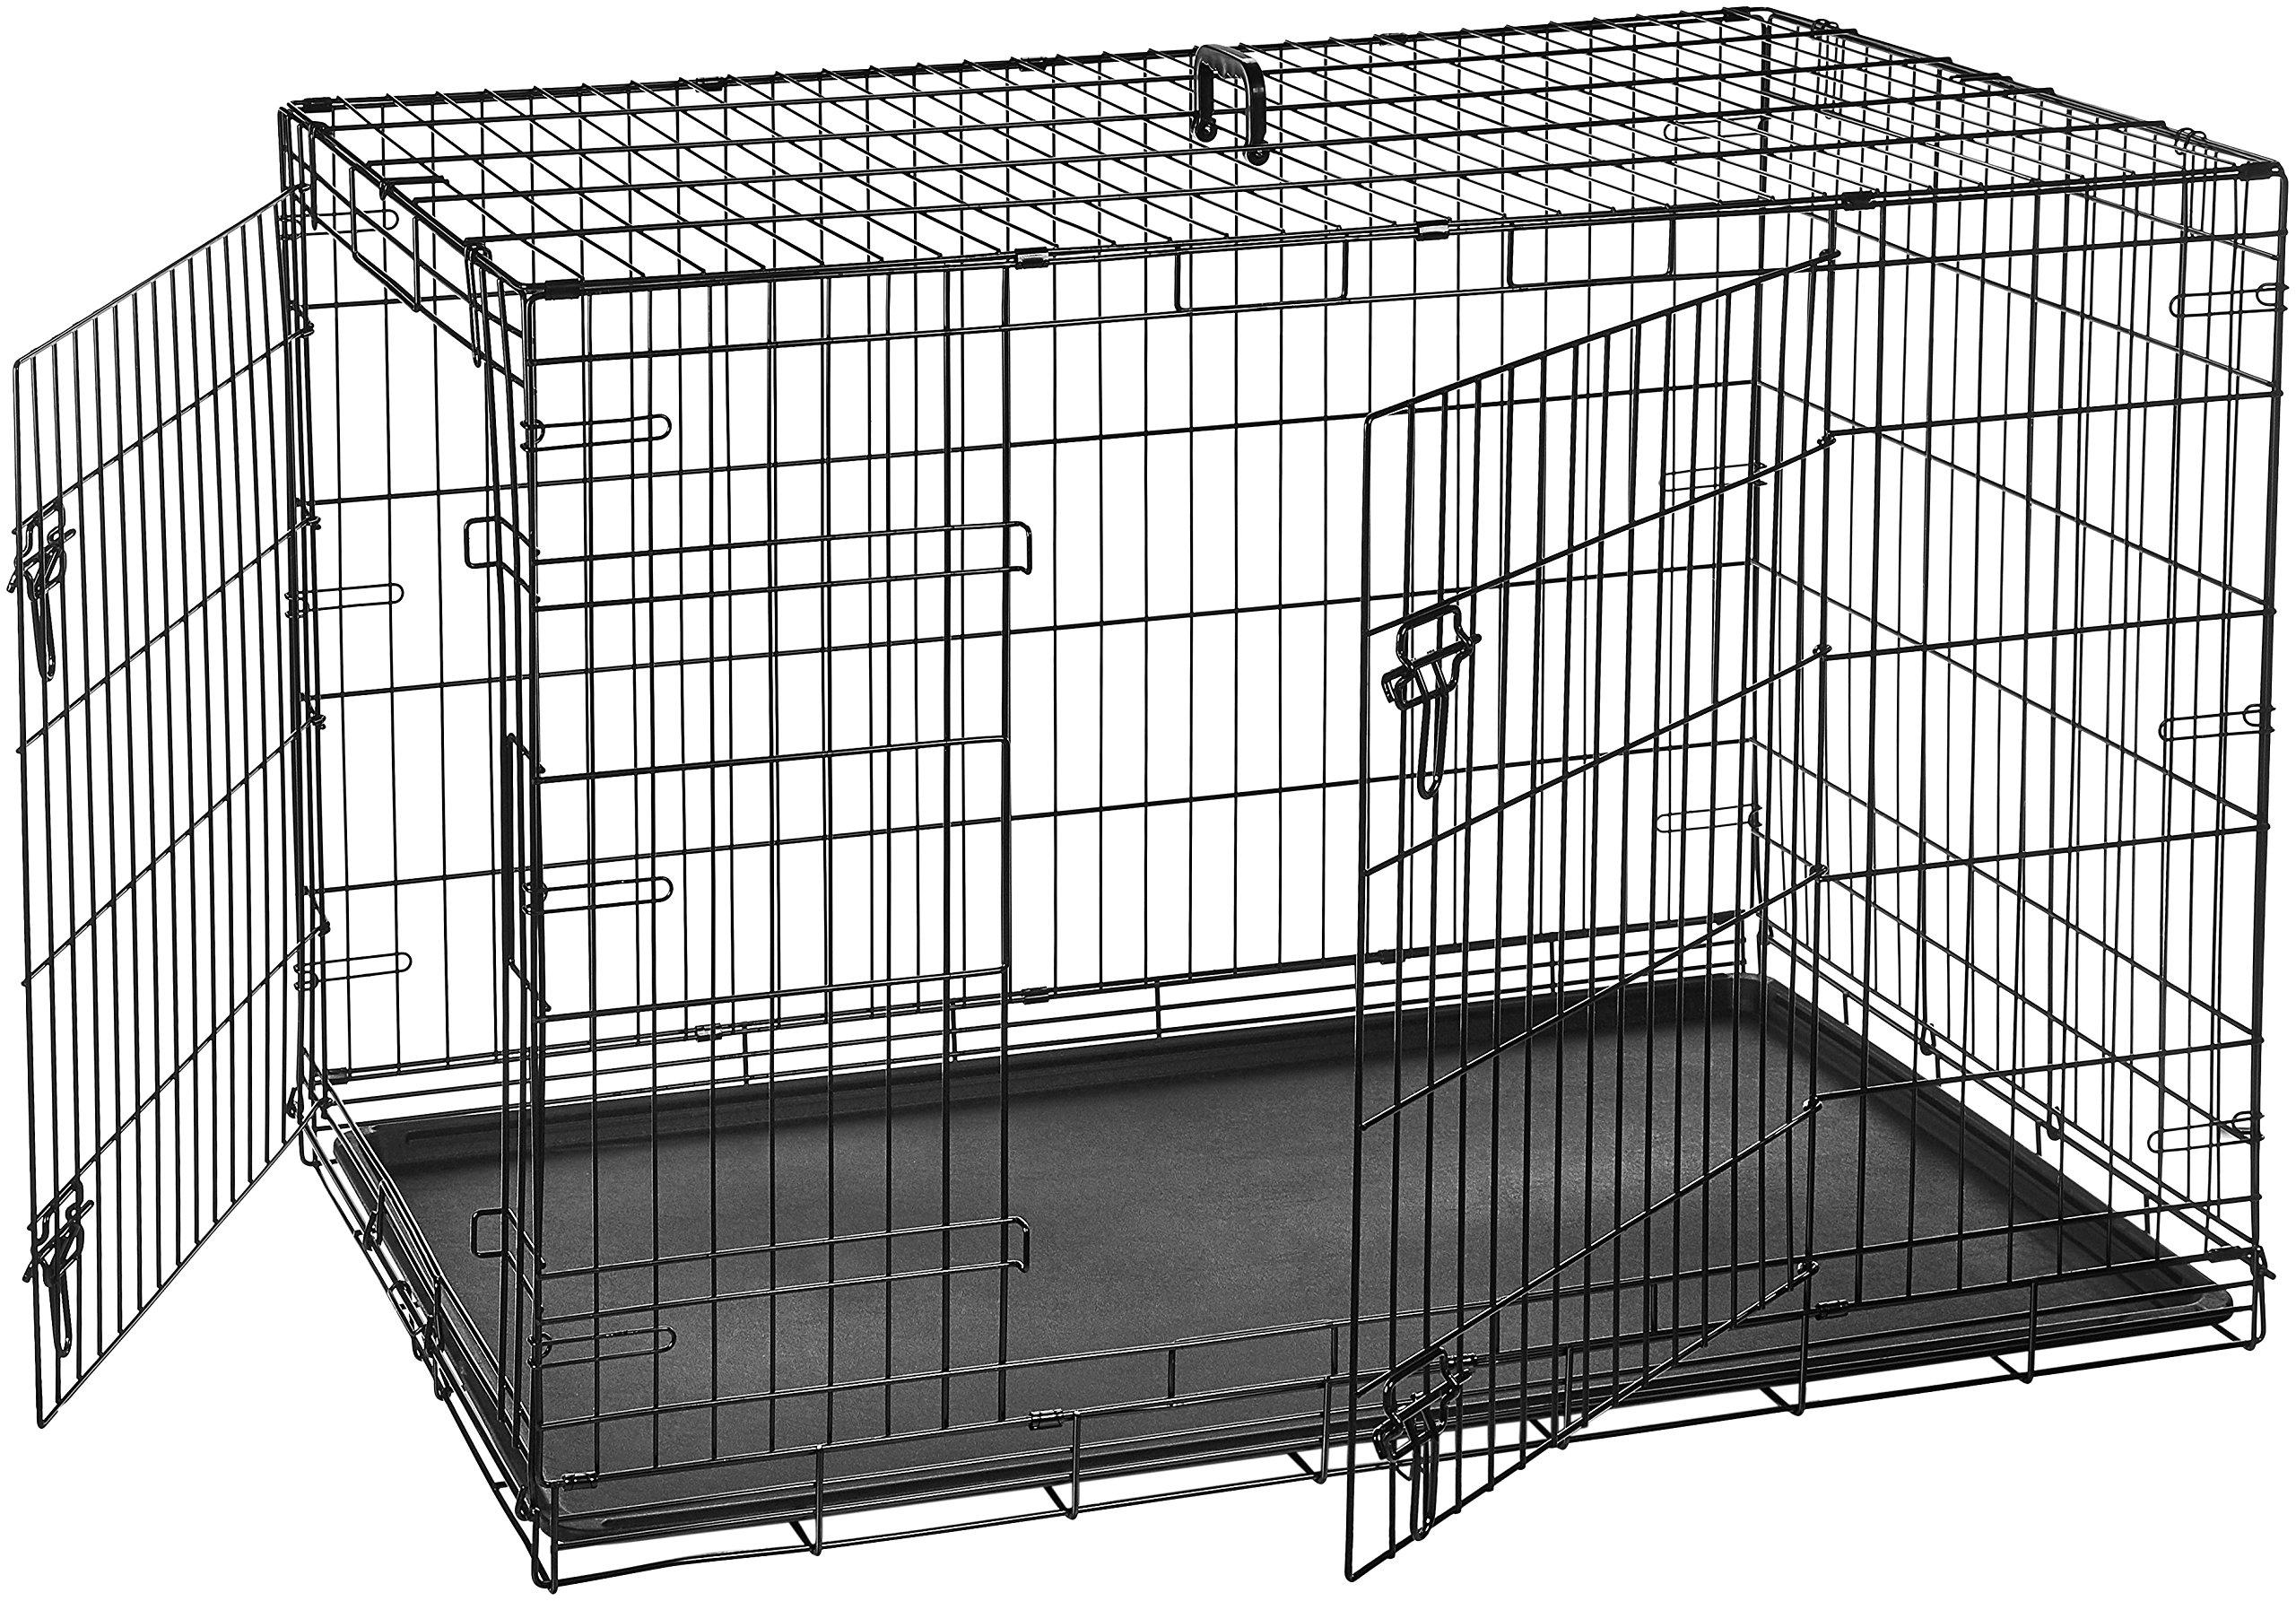 AmazonBasics Double Door Folding Metal Crate